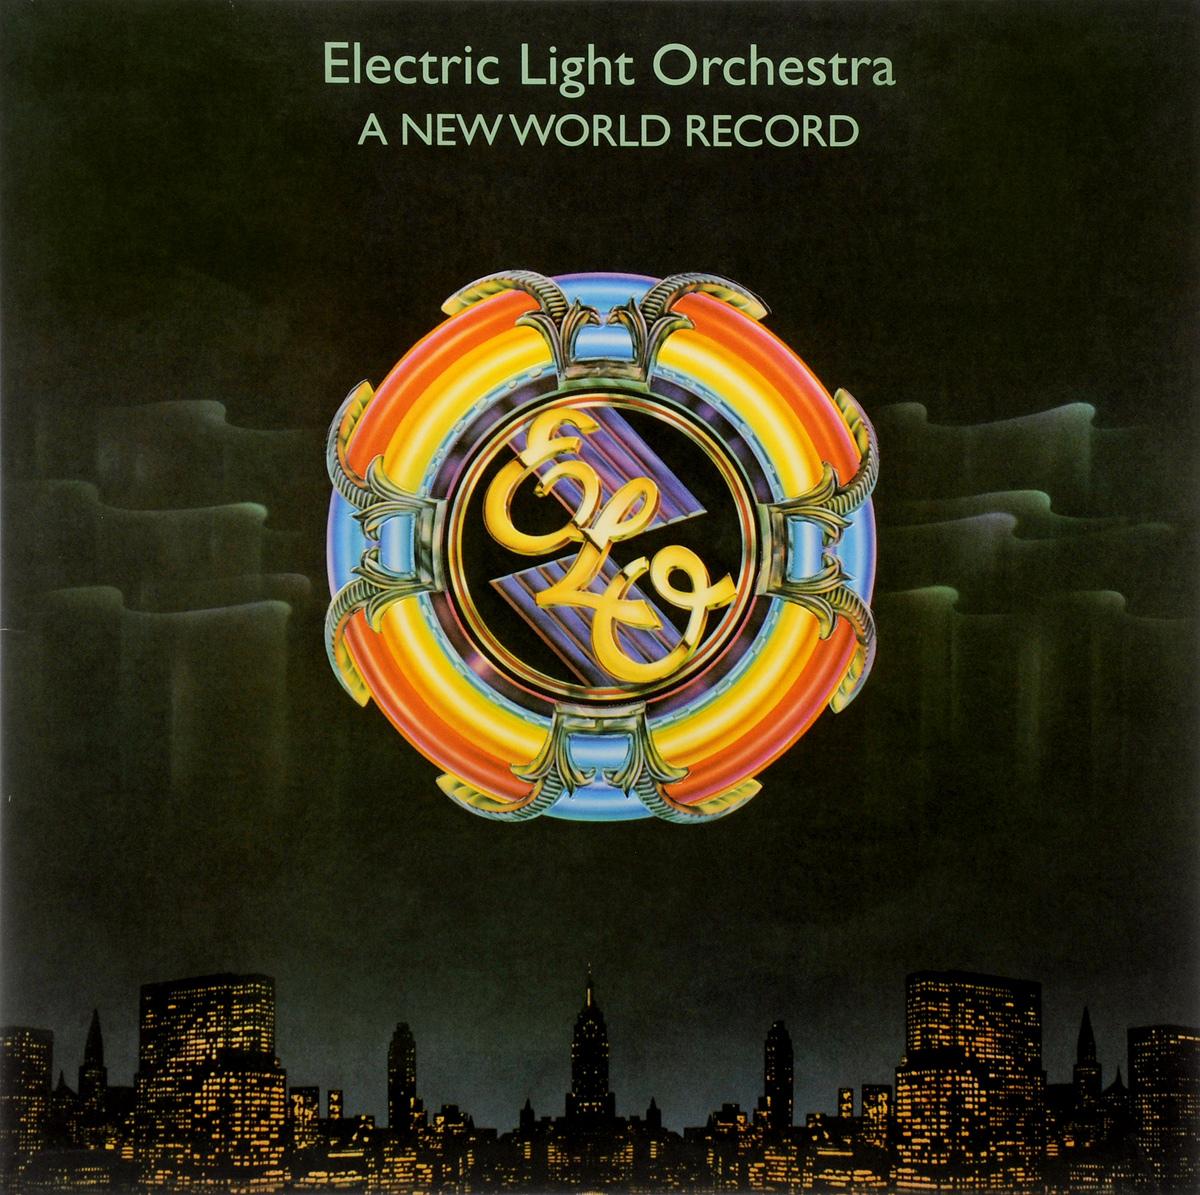 Electric Light Orchestra Electric Light Orchestra. A New World Record (LP) electric light orchestra – a new world record lp